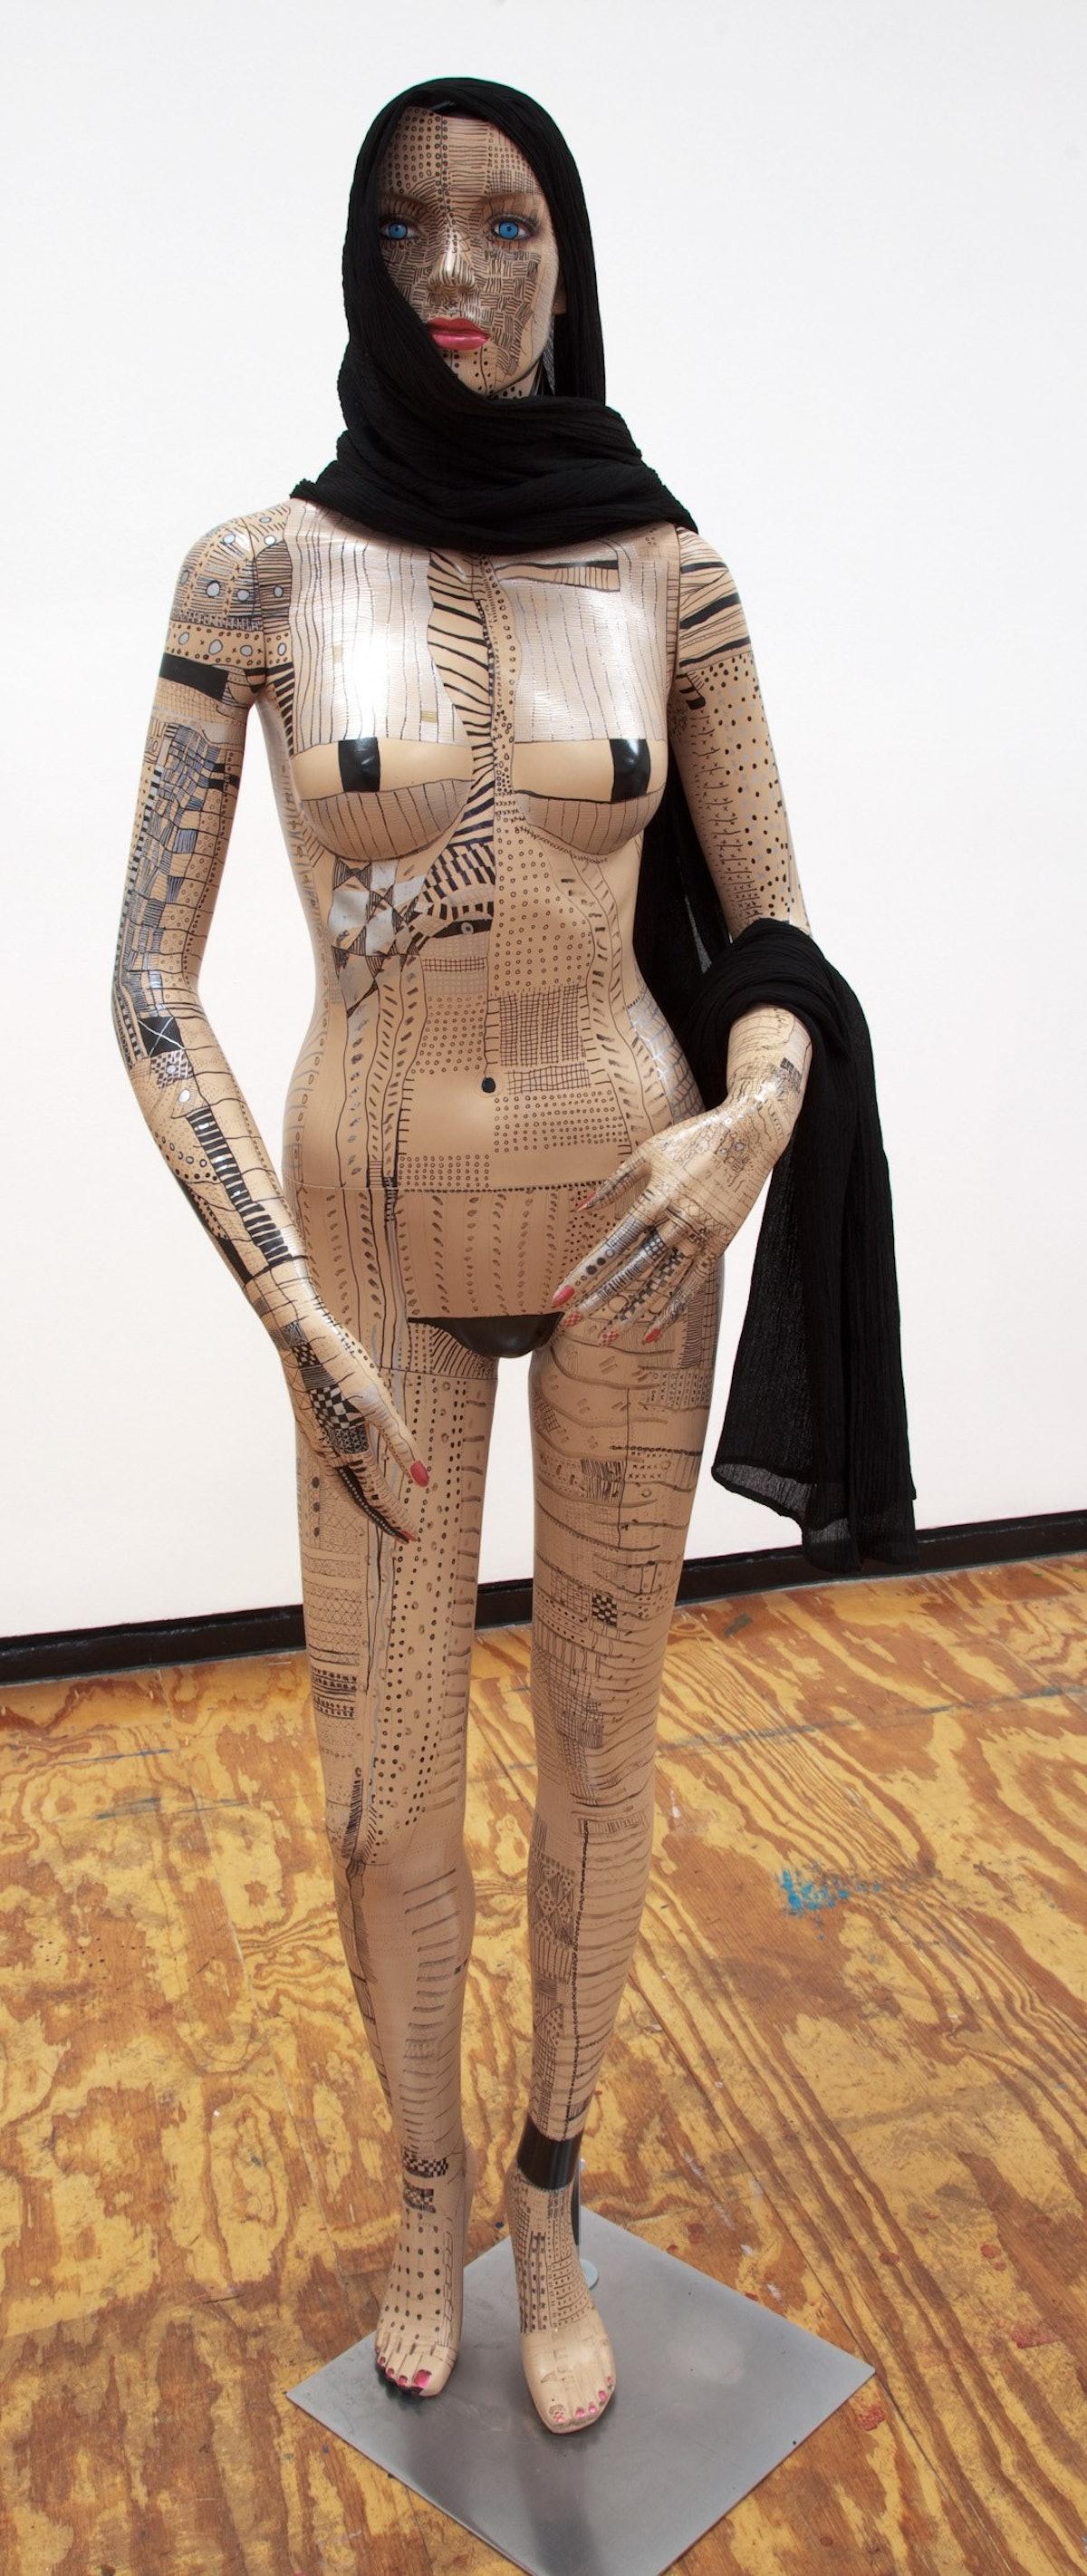 mannequin-fullbody.jpg